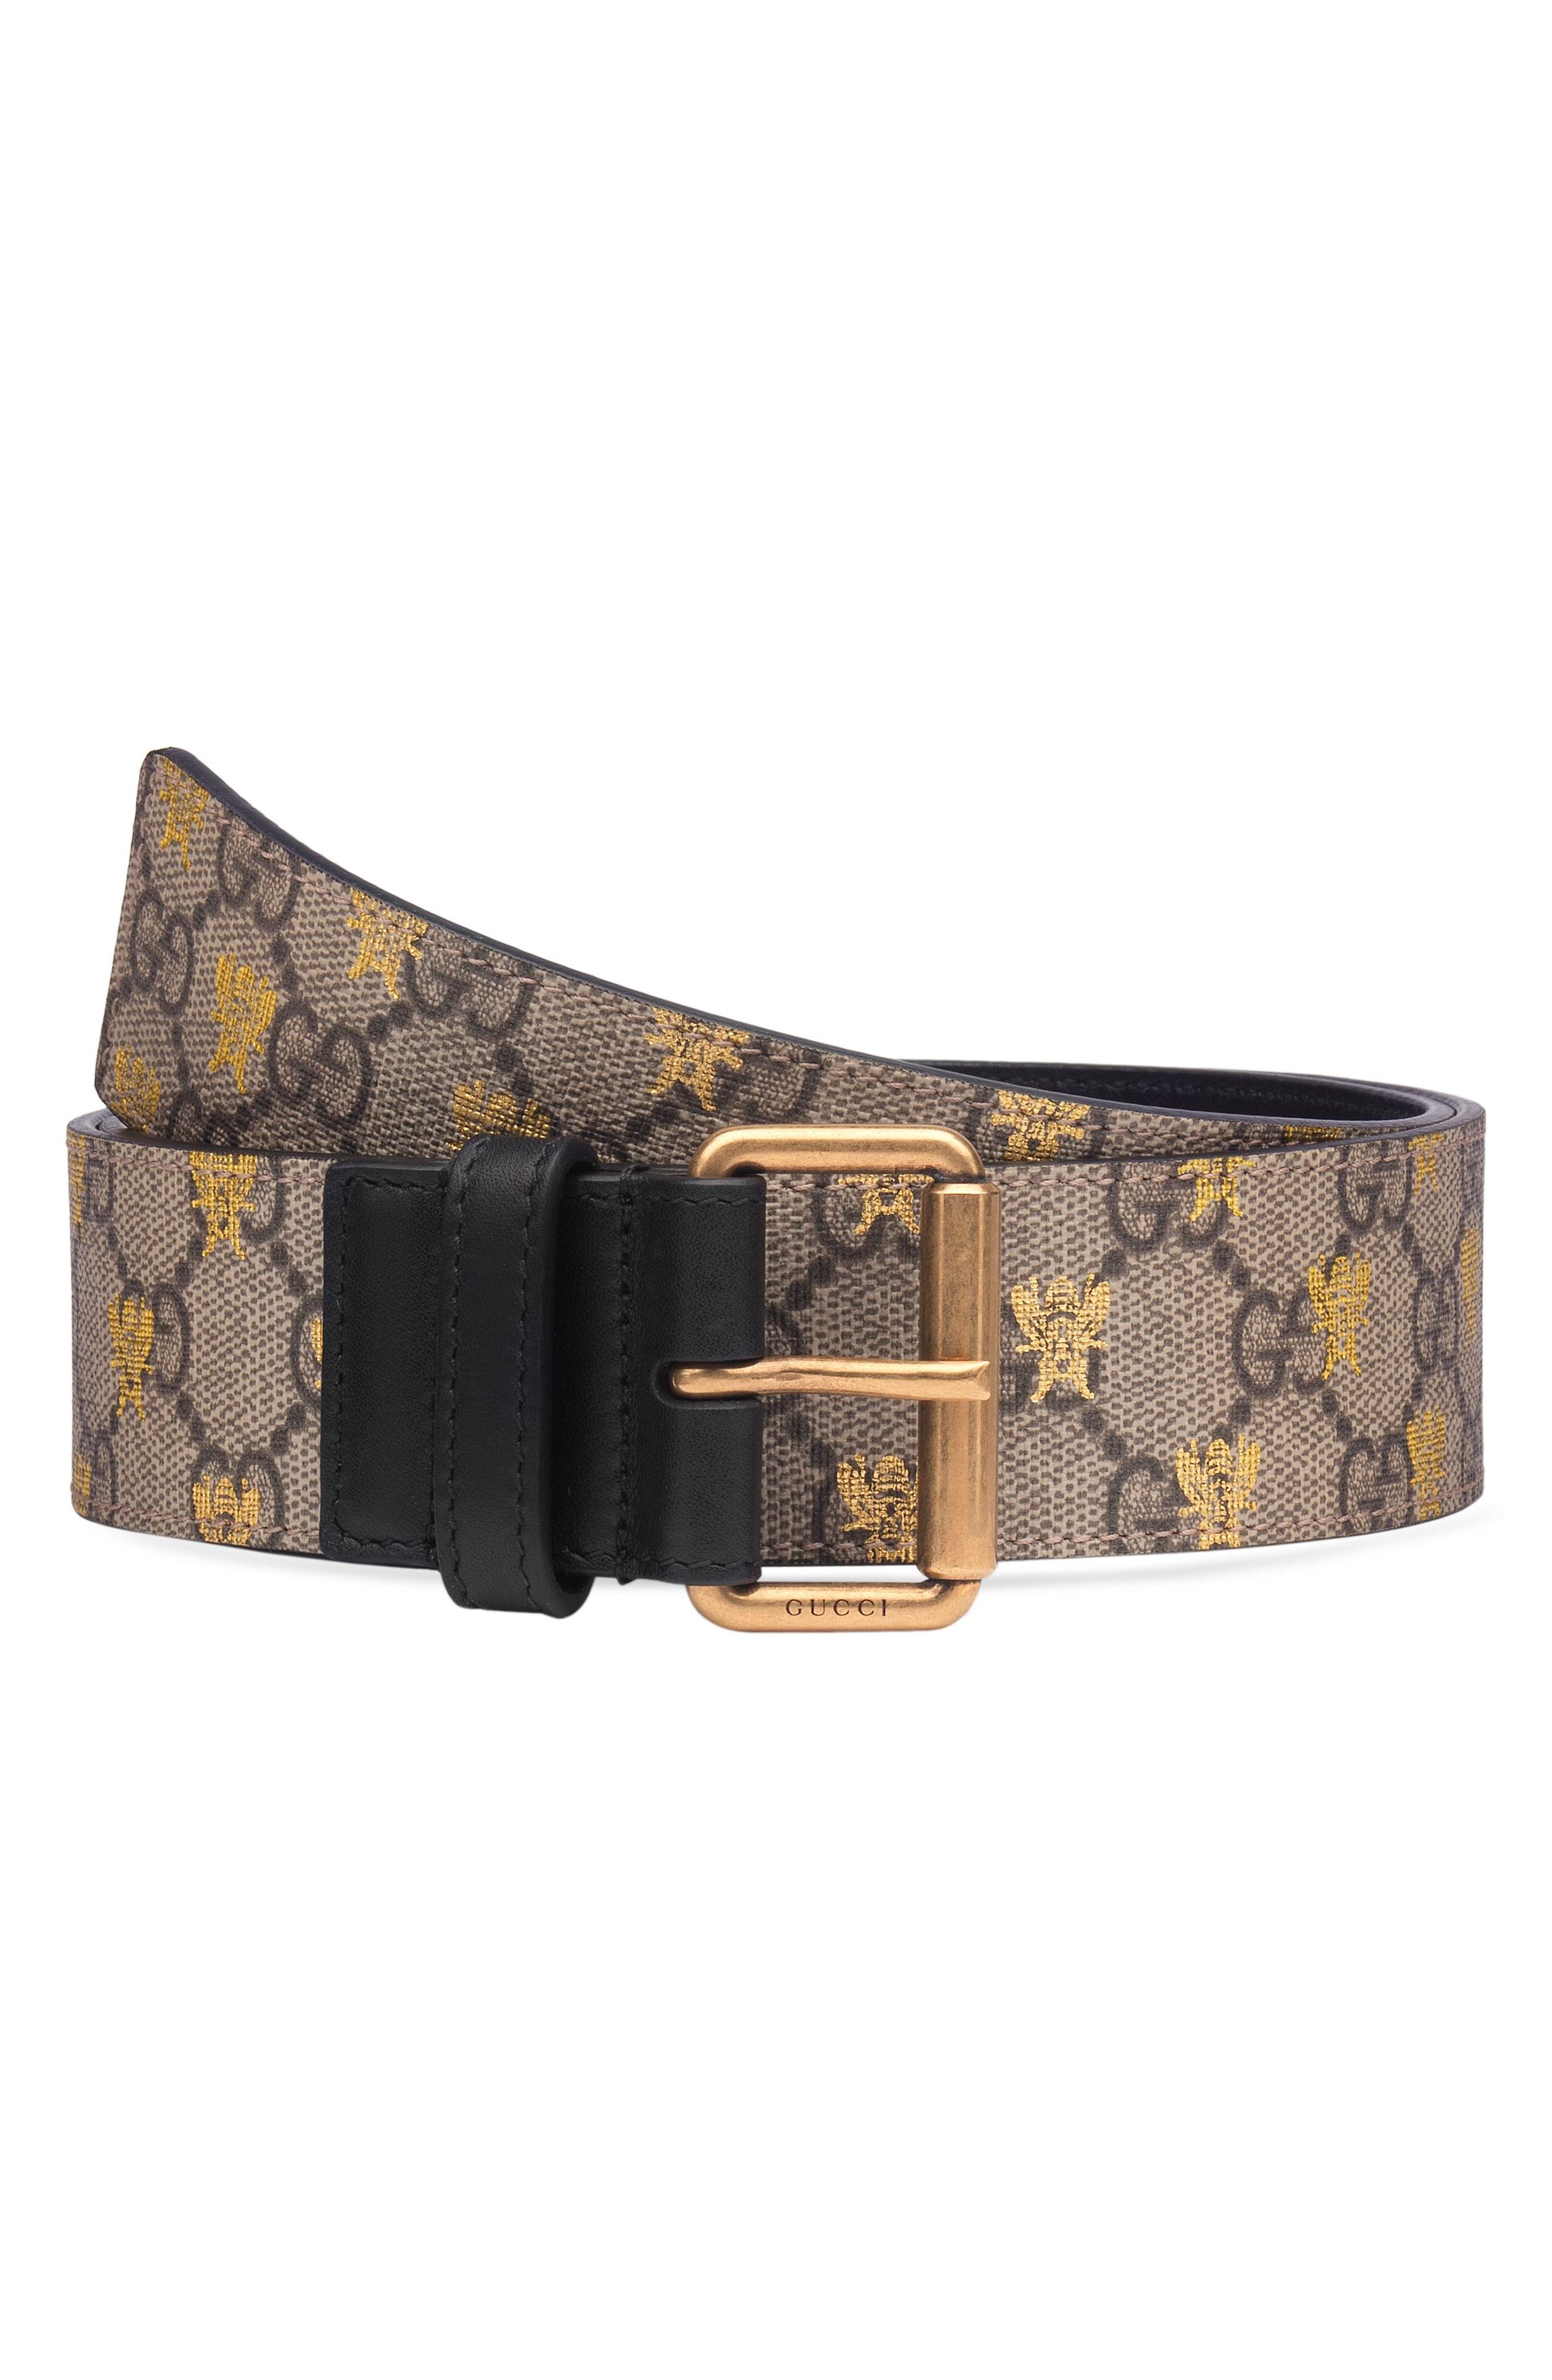 Gucci GG Supreme Canvas Belt